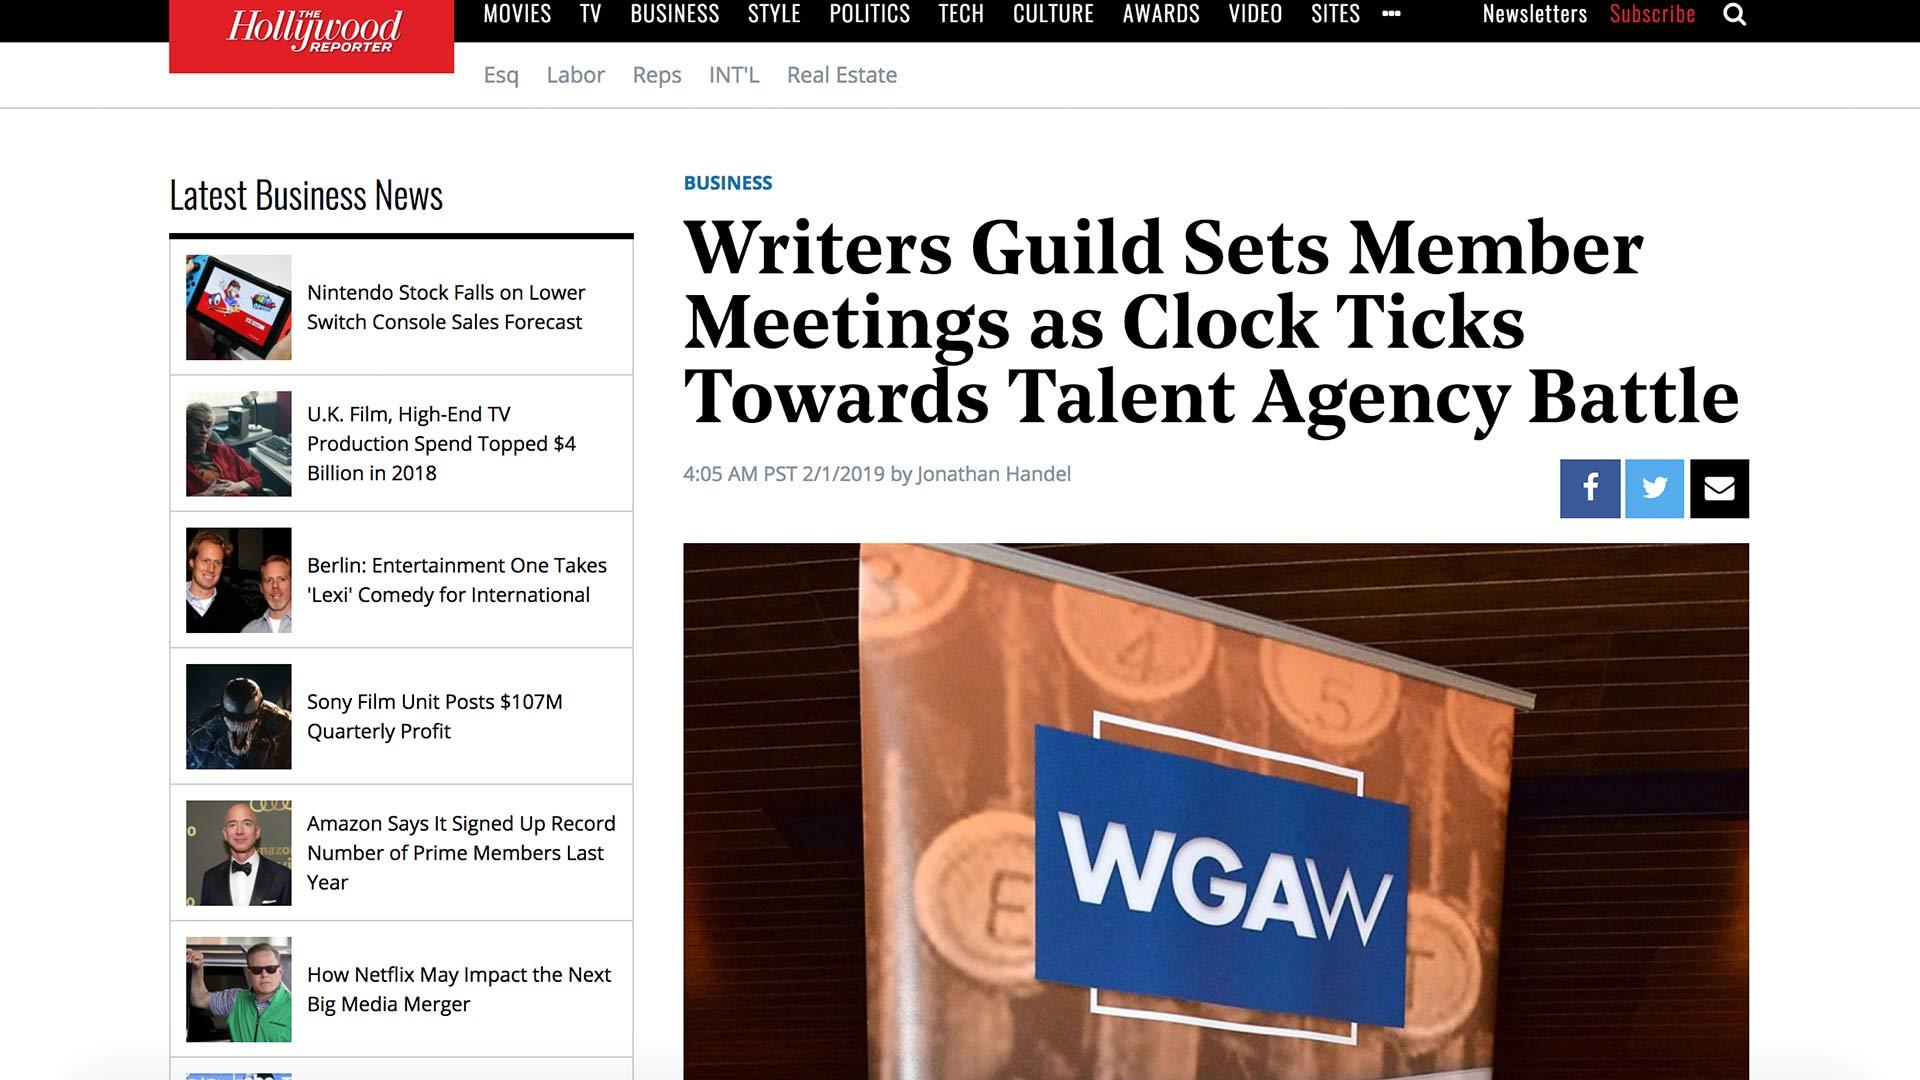 Fairness Rocks News Writers Guild Sets Member Meetings as Clock Ticks Towards Talent Agency Battle